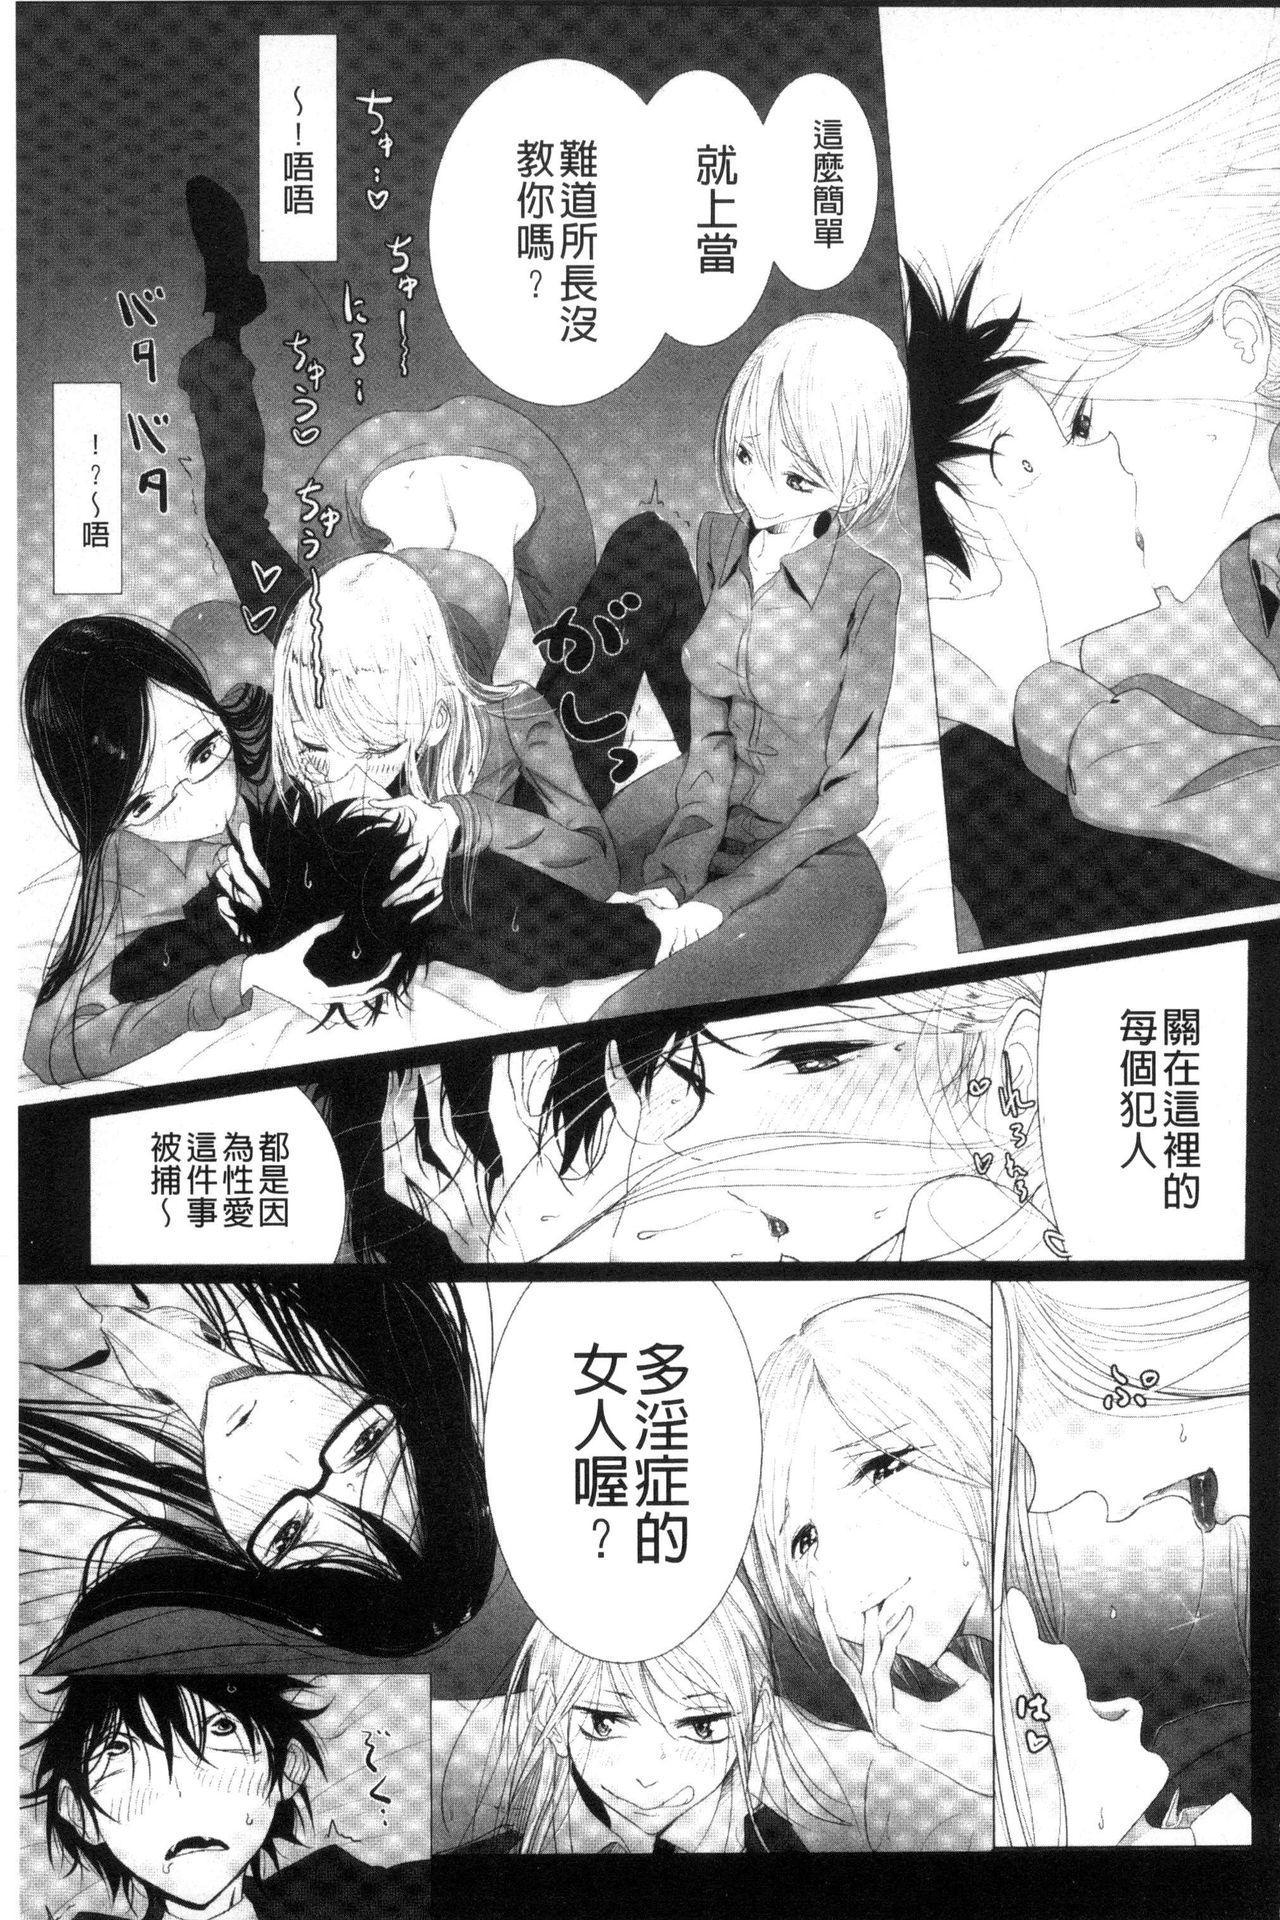 [Dhibi] Sono Yubisaki de Korogashite - Please Caress it at the Finger-tip. [Chinese] 160